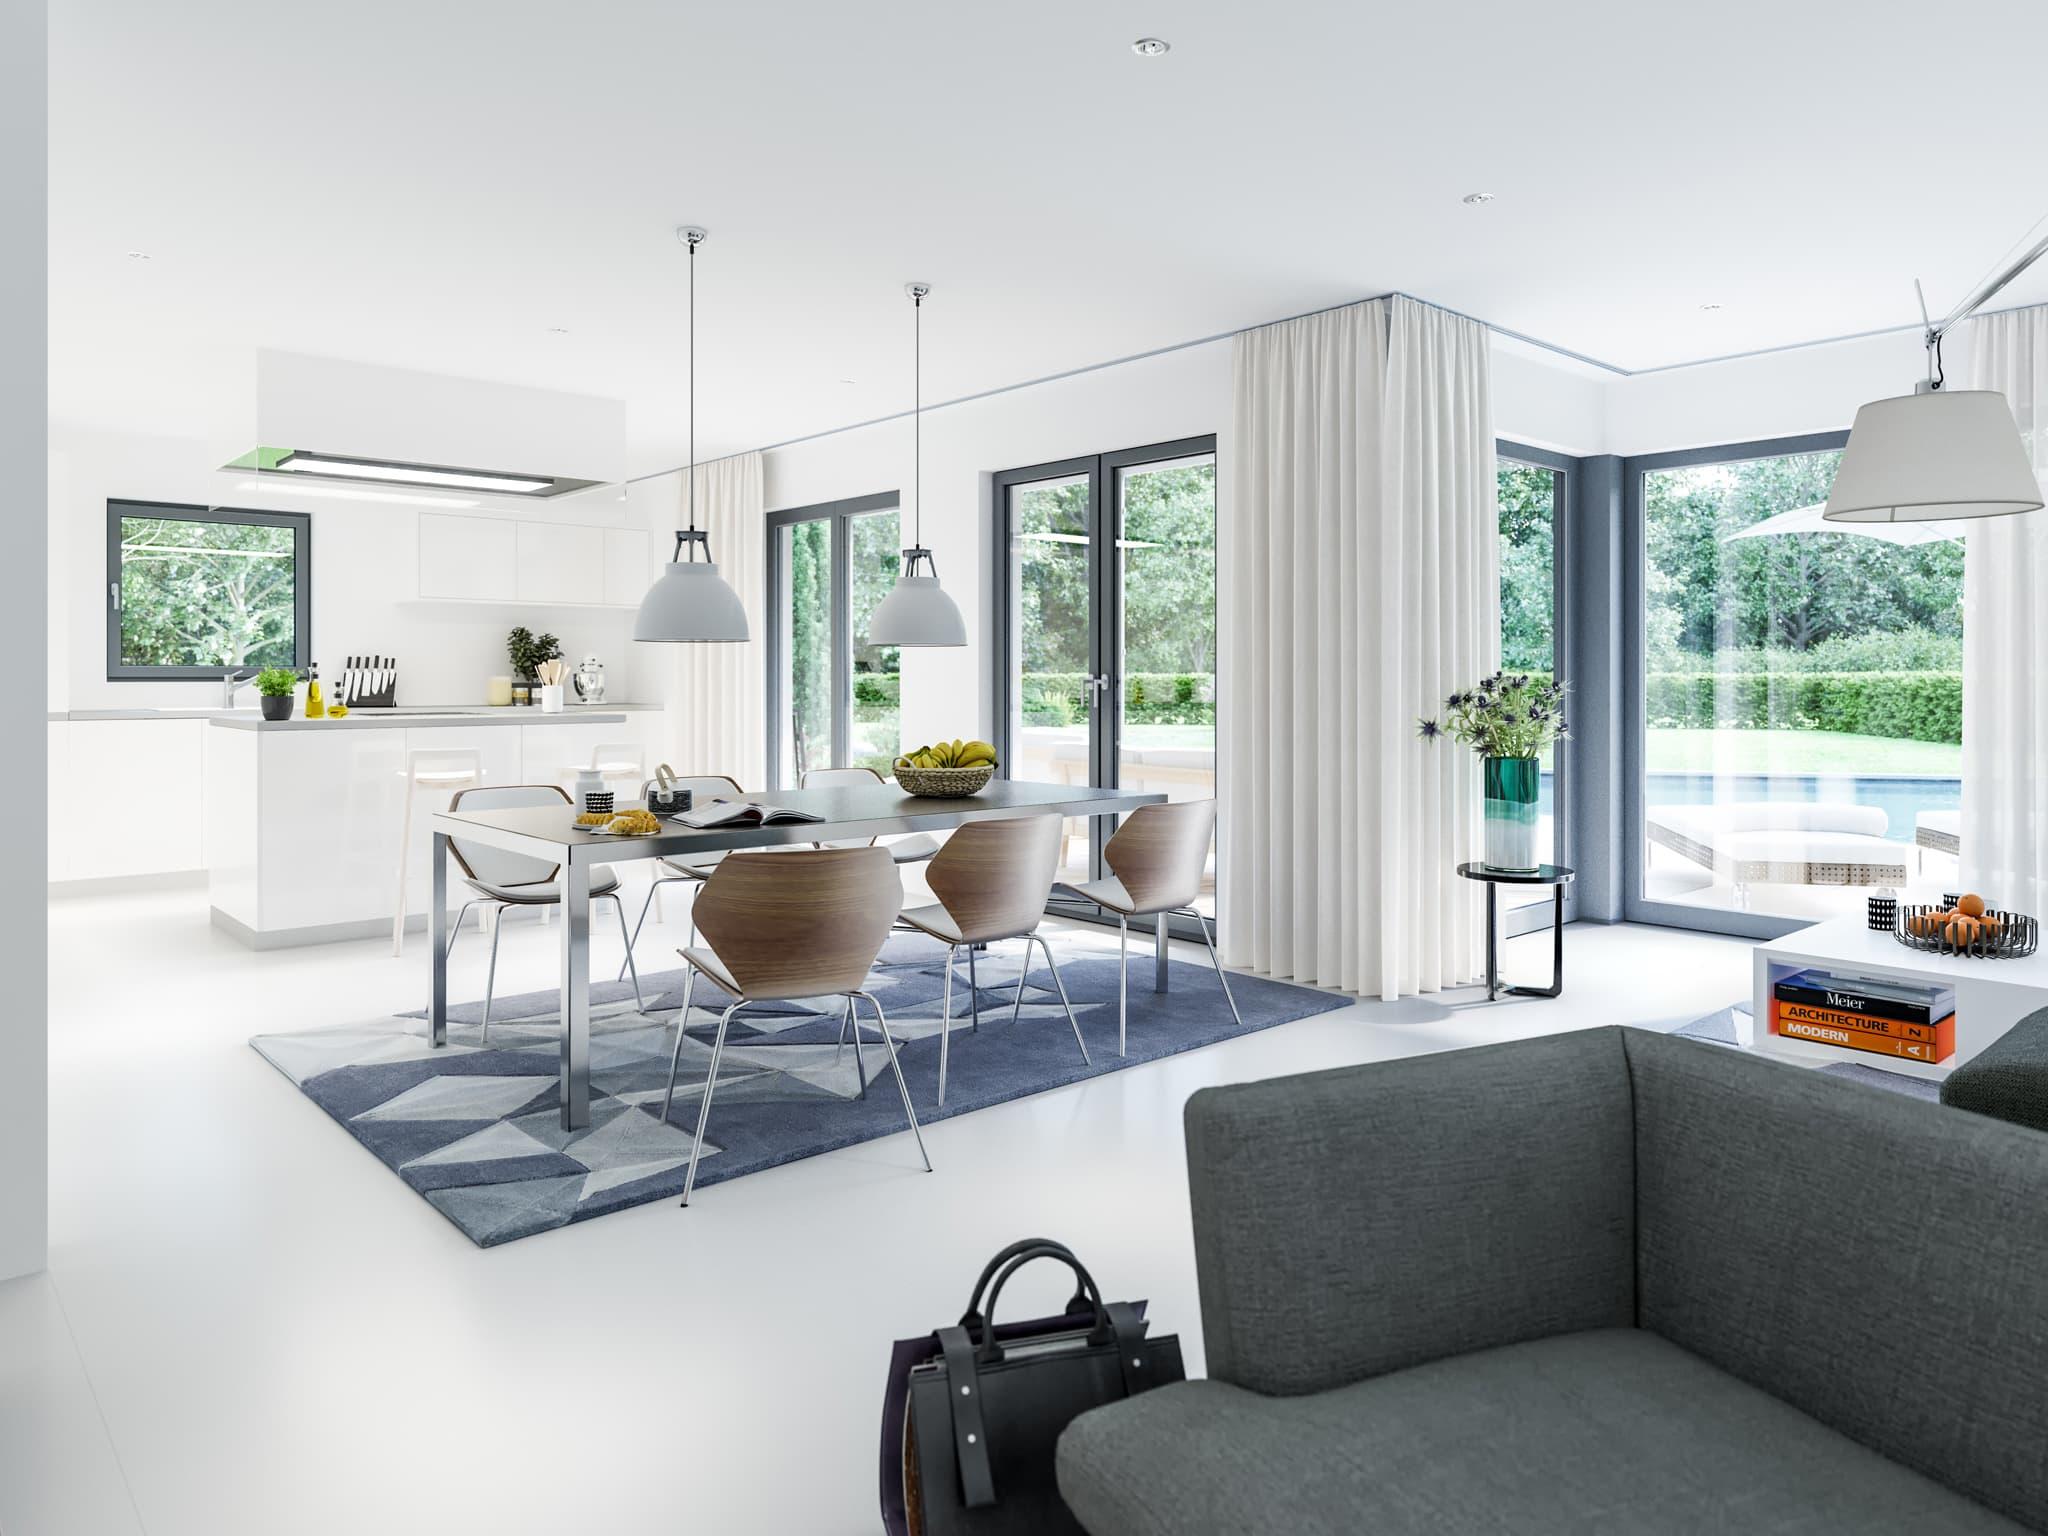 Wohn-Esszimmer Ideen - Einfamilienhaus Inneneinrichtung Fertighaus Living Haus SUNSHINE 143 V3 - HausbauDirekt.de